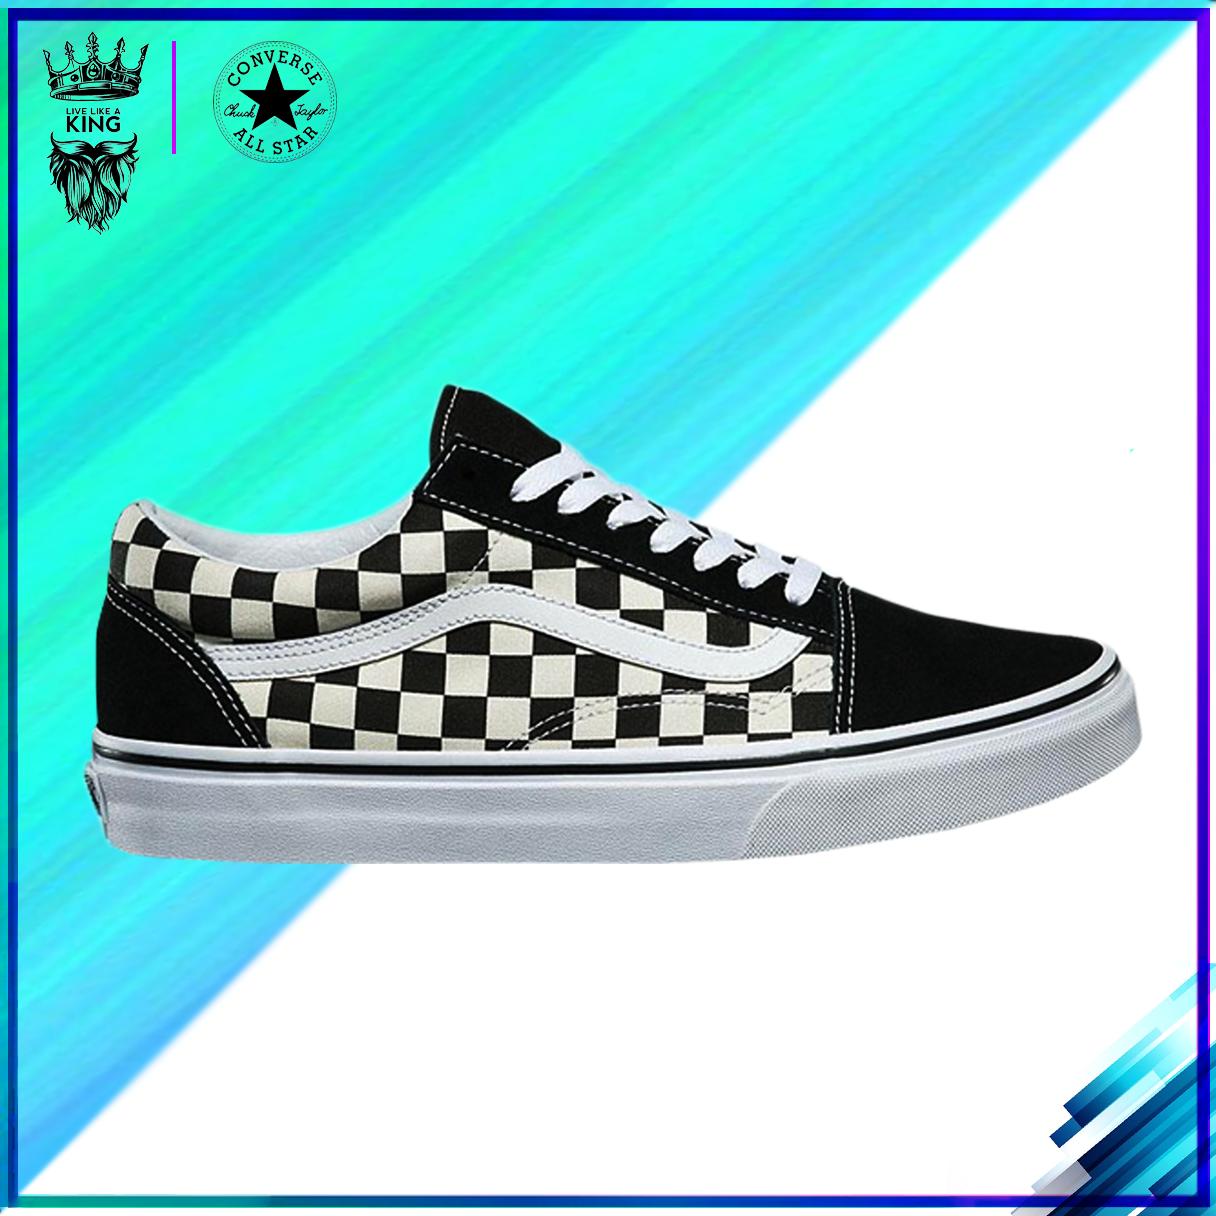 [FULLBOX+ tặng VỚ] Giày Sneaker VANS-OLD SKOOL (nam nữ) CARO hàng VNXK